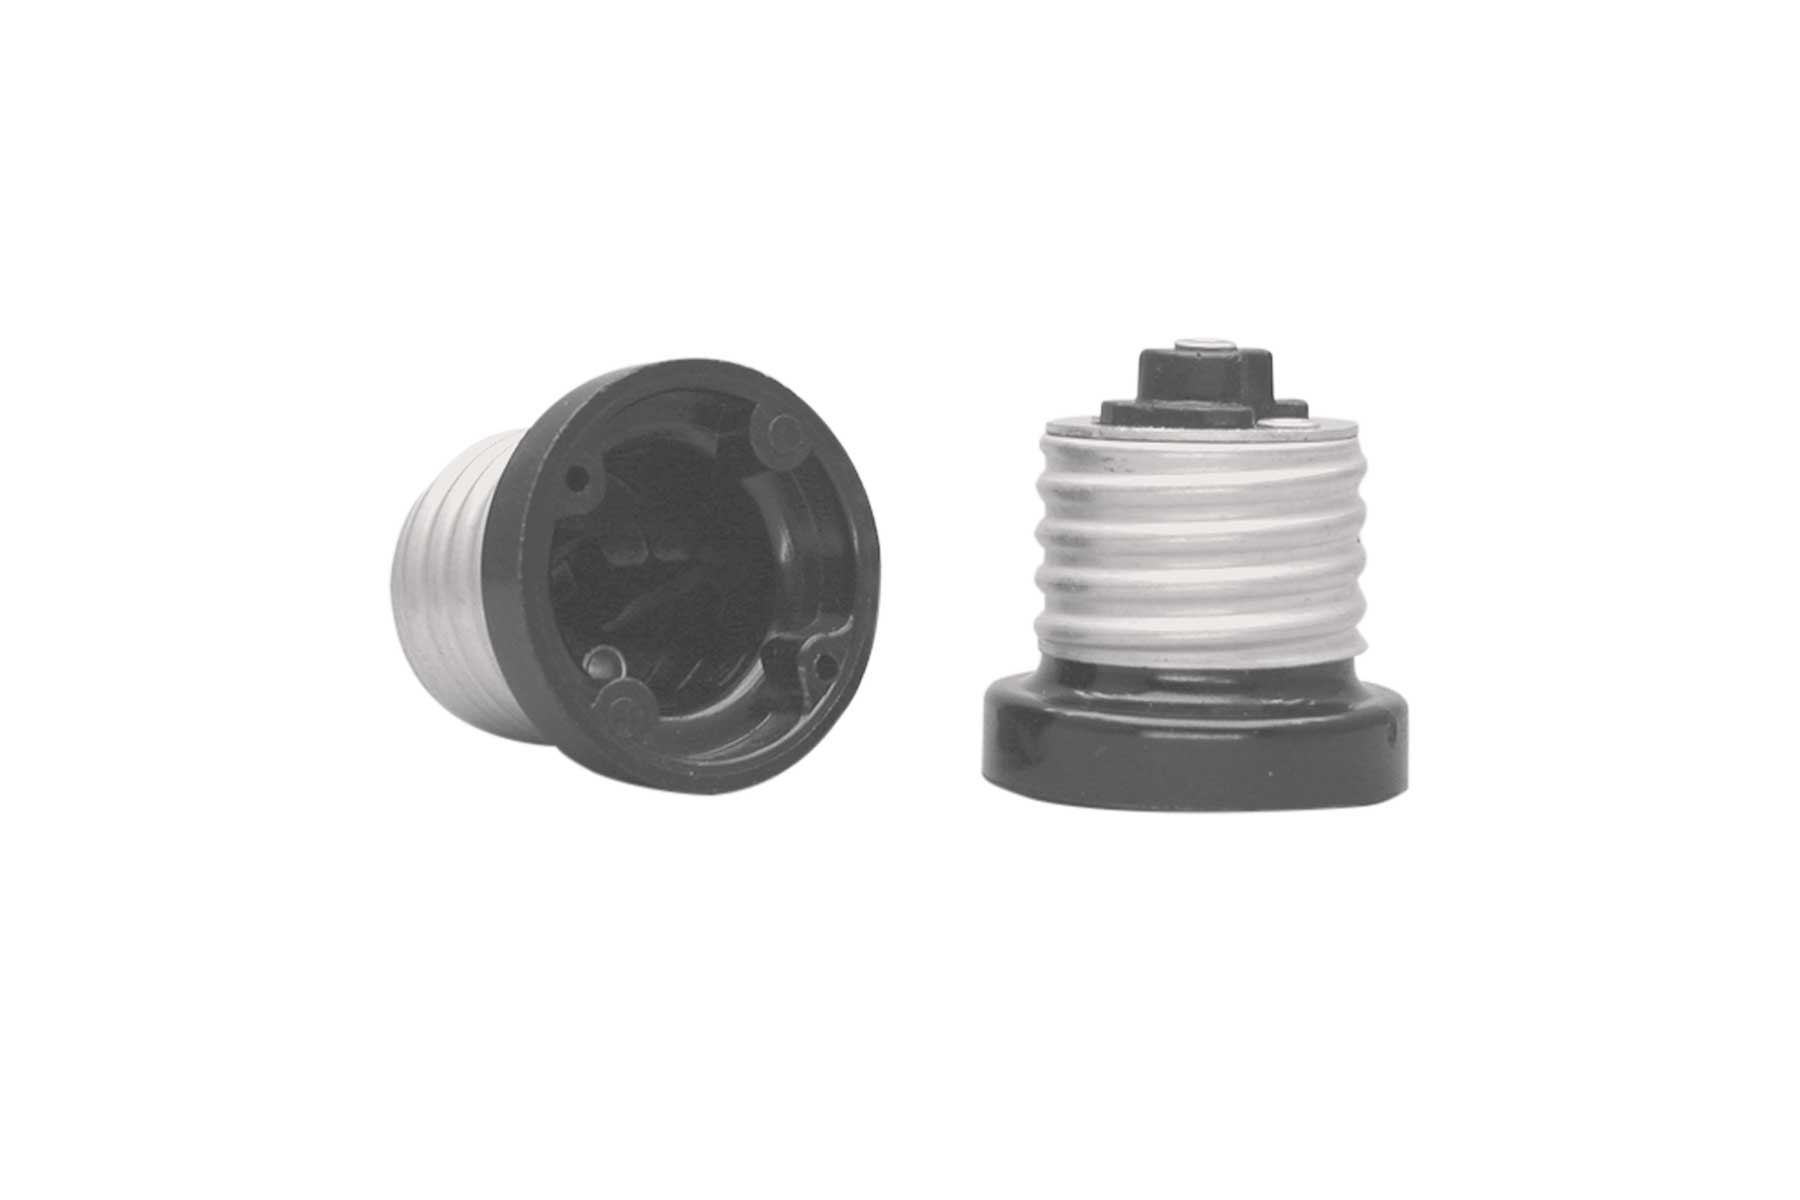 Medium Base Phenolic Flanged Incandescent Light Socket Adapter